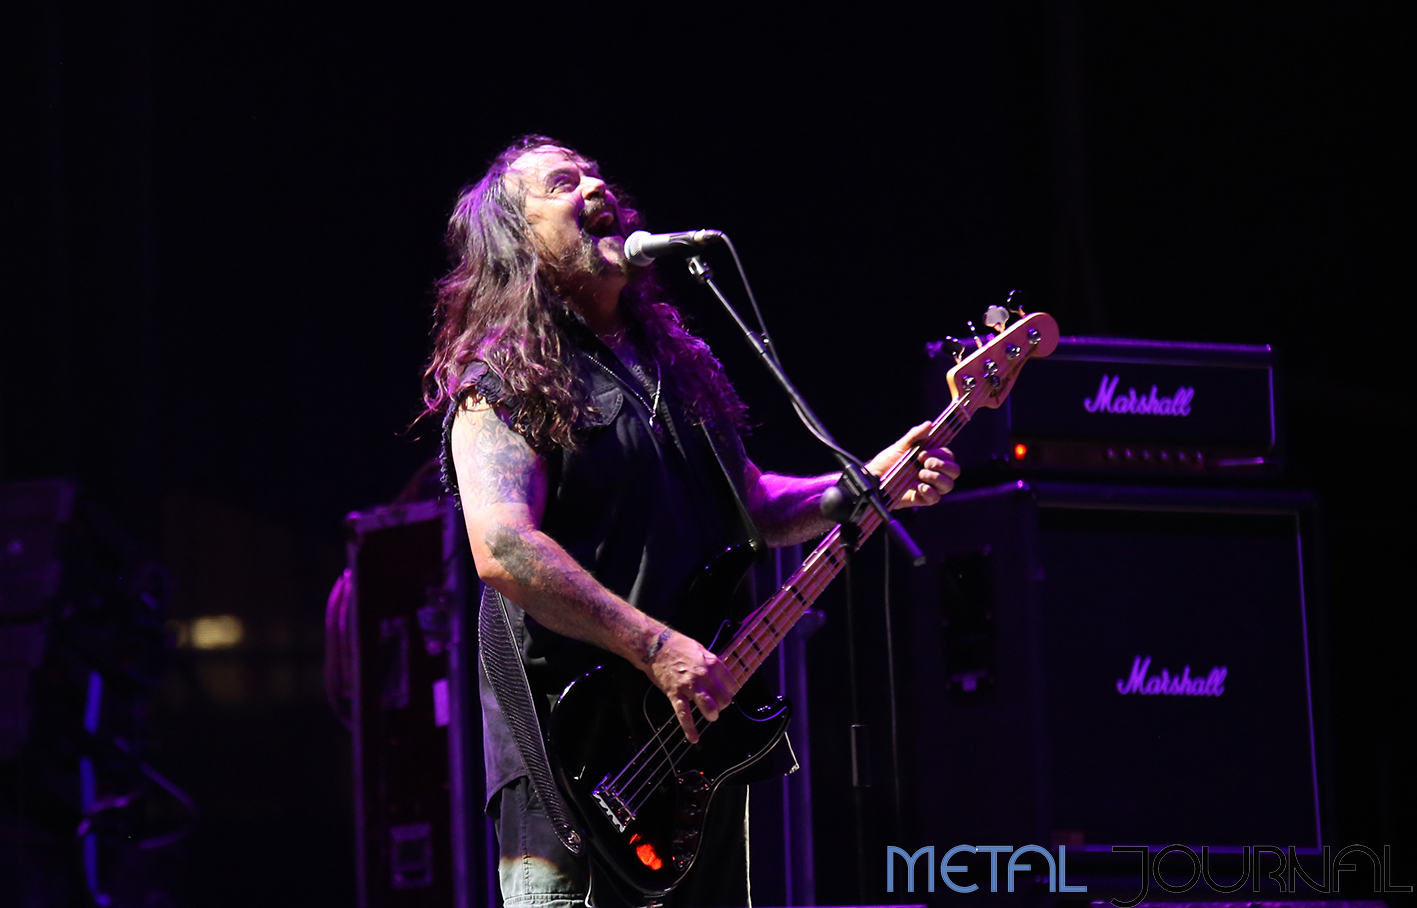 deicide - leyendas del rock 2019 metal journal pic 3